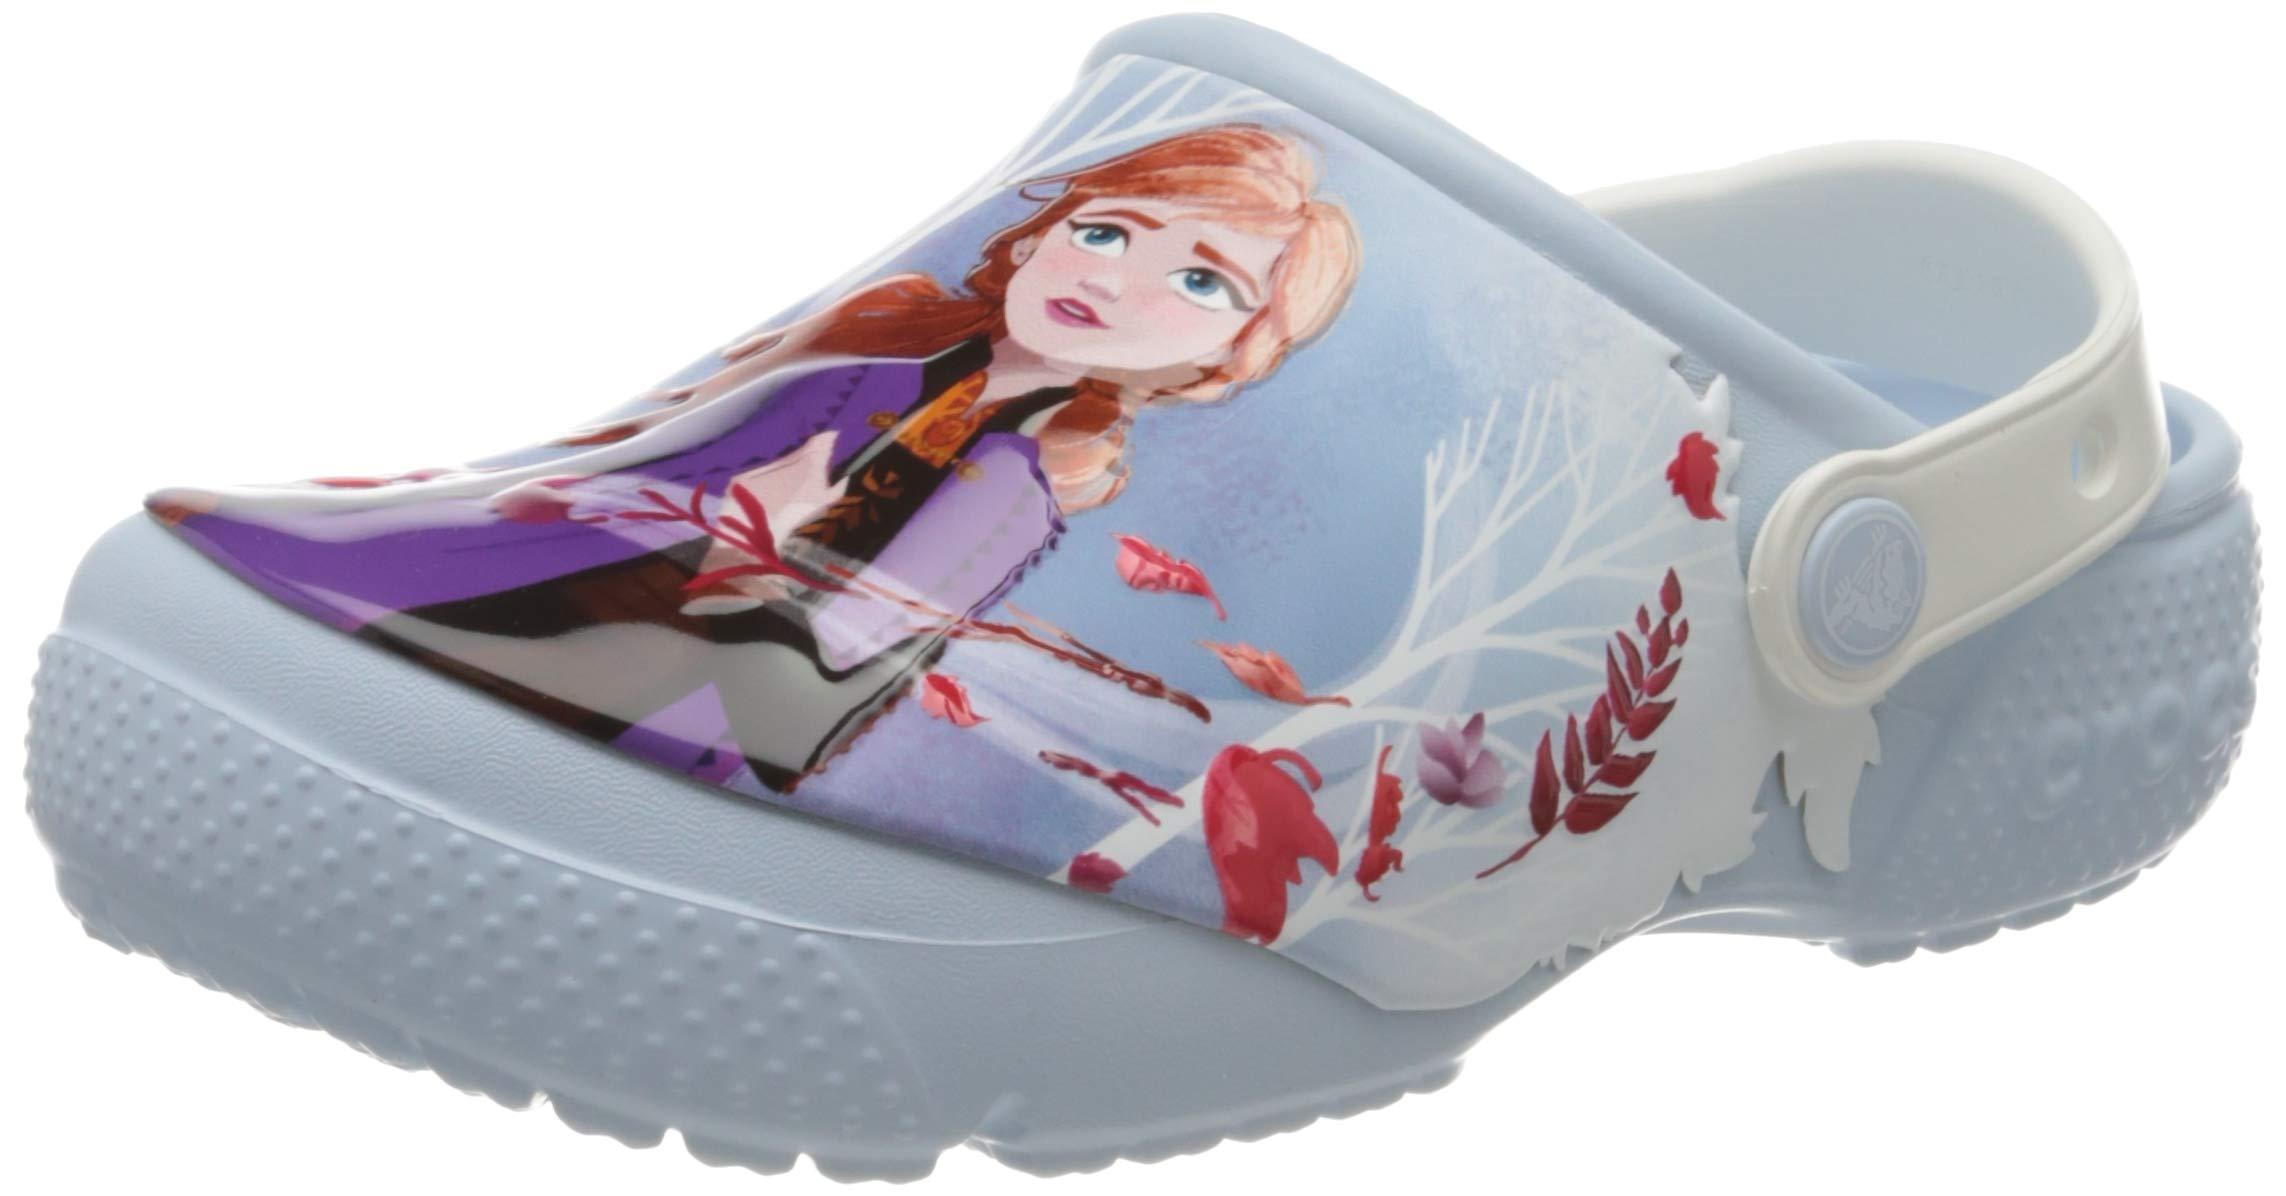 Crocs Kids Frozen 2 Clog|Water Shoe for Toddlers, Boys, Girls|Slip on Sandal